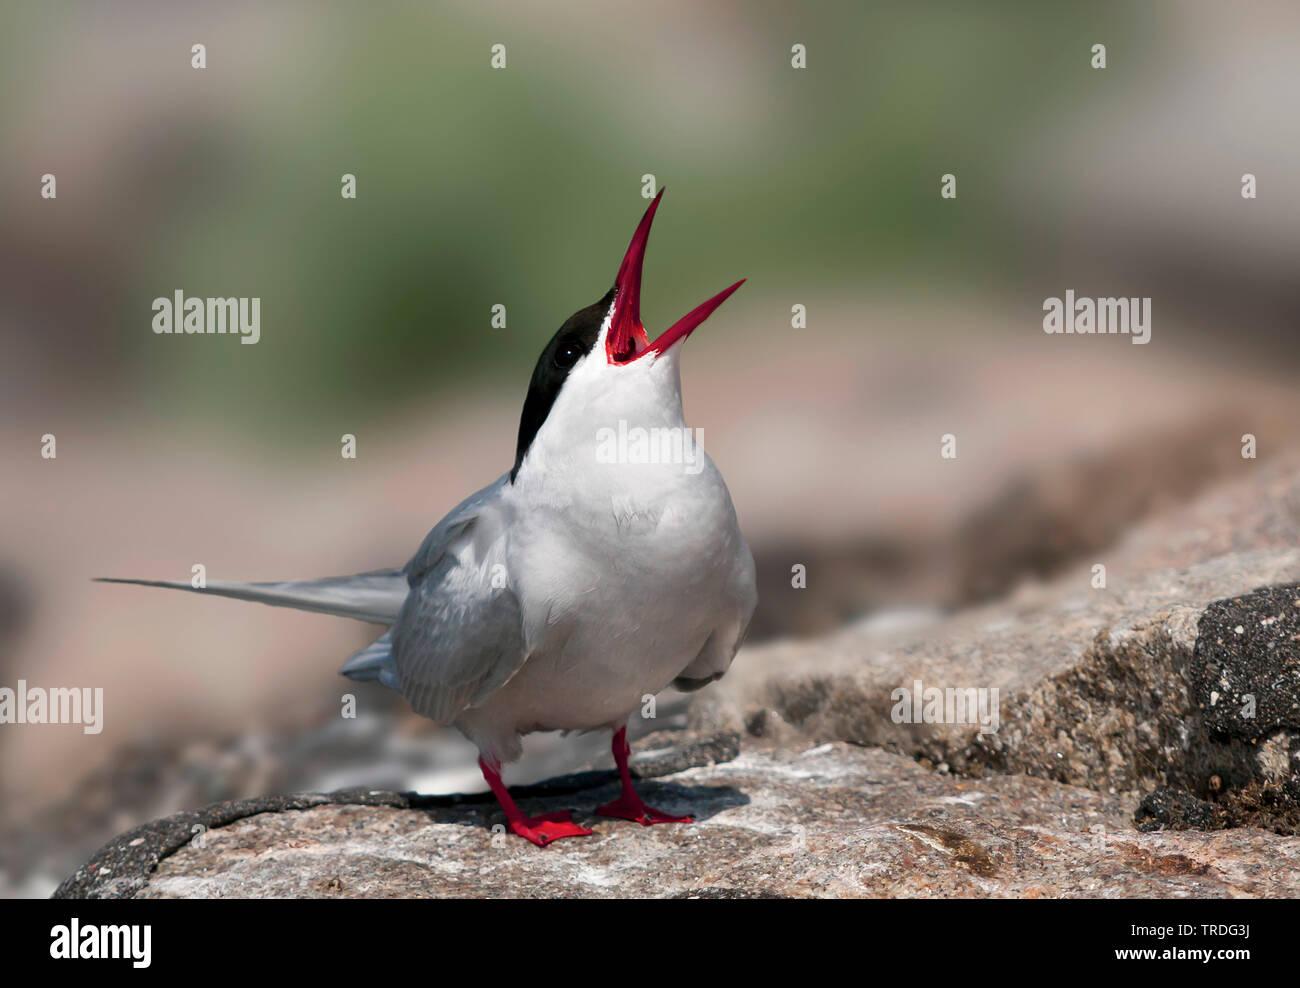 Kuestenseeschwalbe, Kuesten-Seeschwalbe (Sterna paradisaea), am Boden, rufend, Deutschland   arctic tern (Sterna paradisaea), on the ground, calling, Stock Photo